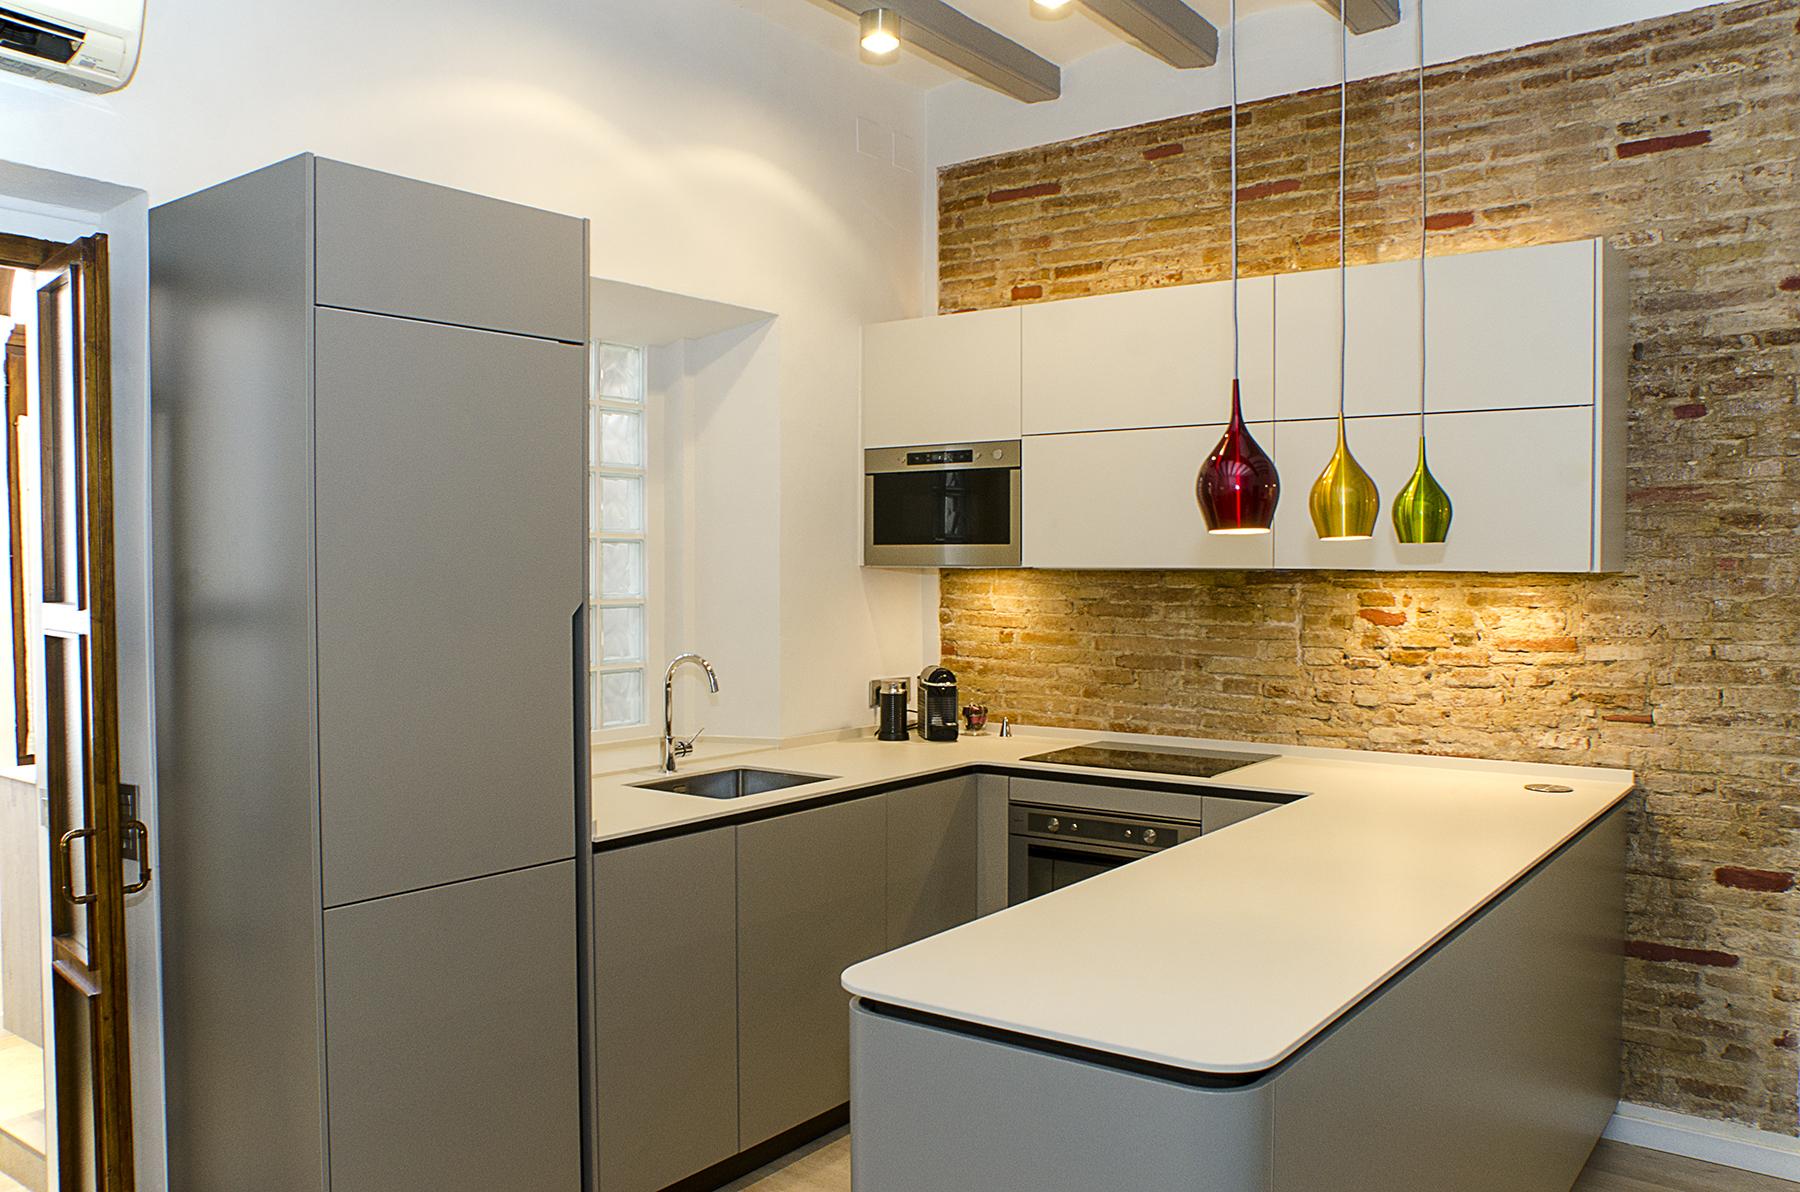 xp muebles de cocina obtenga ideas dise o de muebles